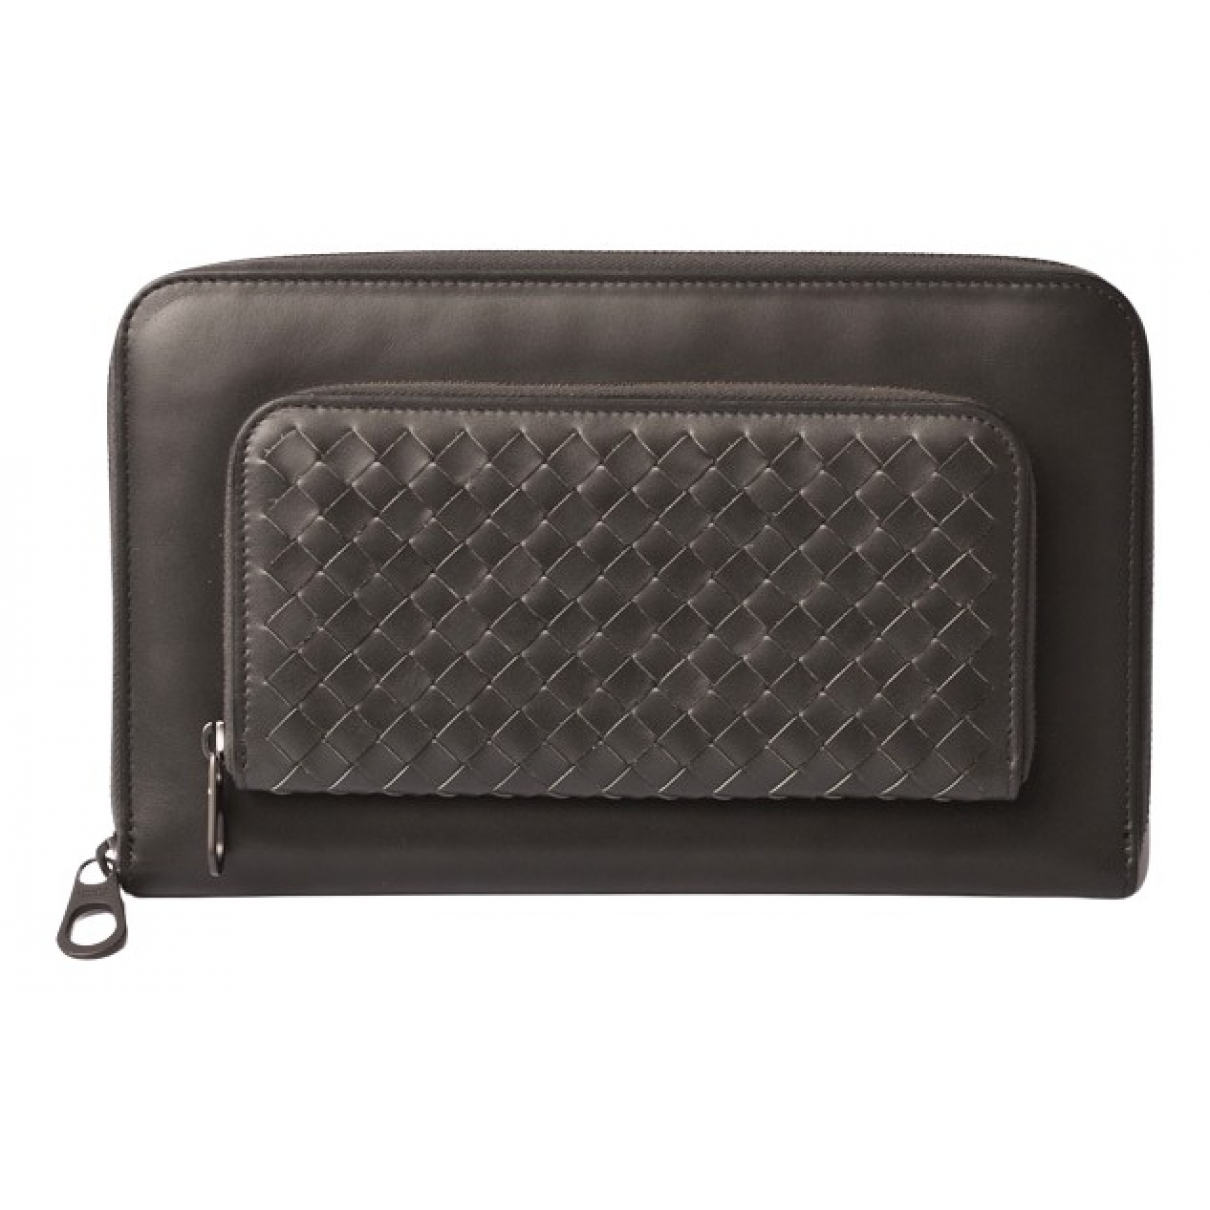 Bottega Veneta N Grey Leather wallet for Women N